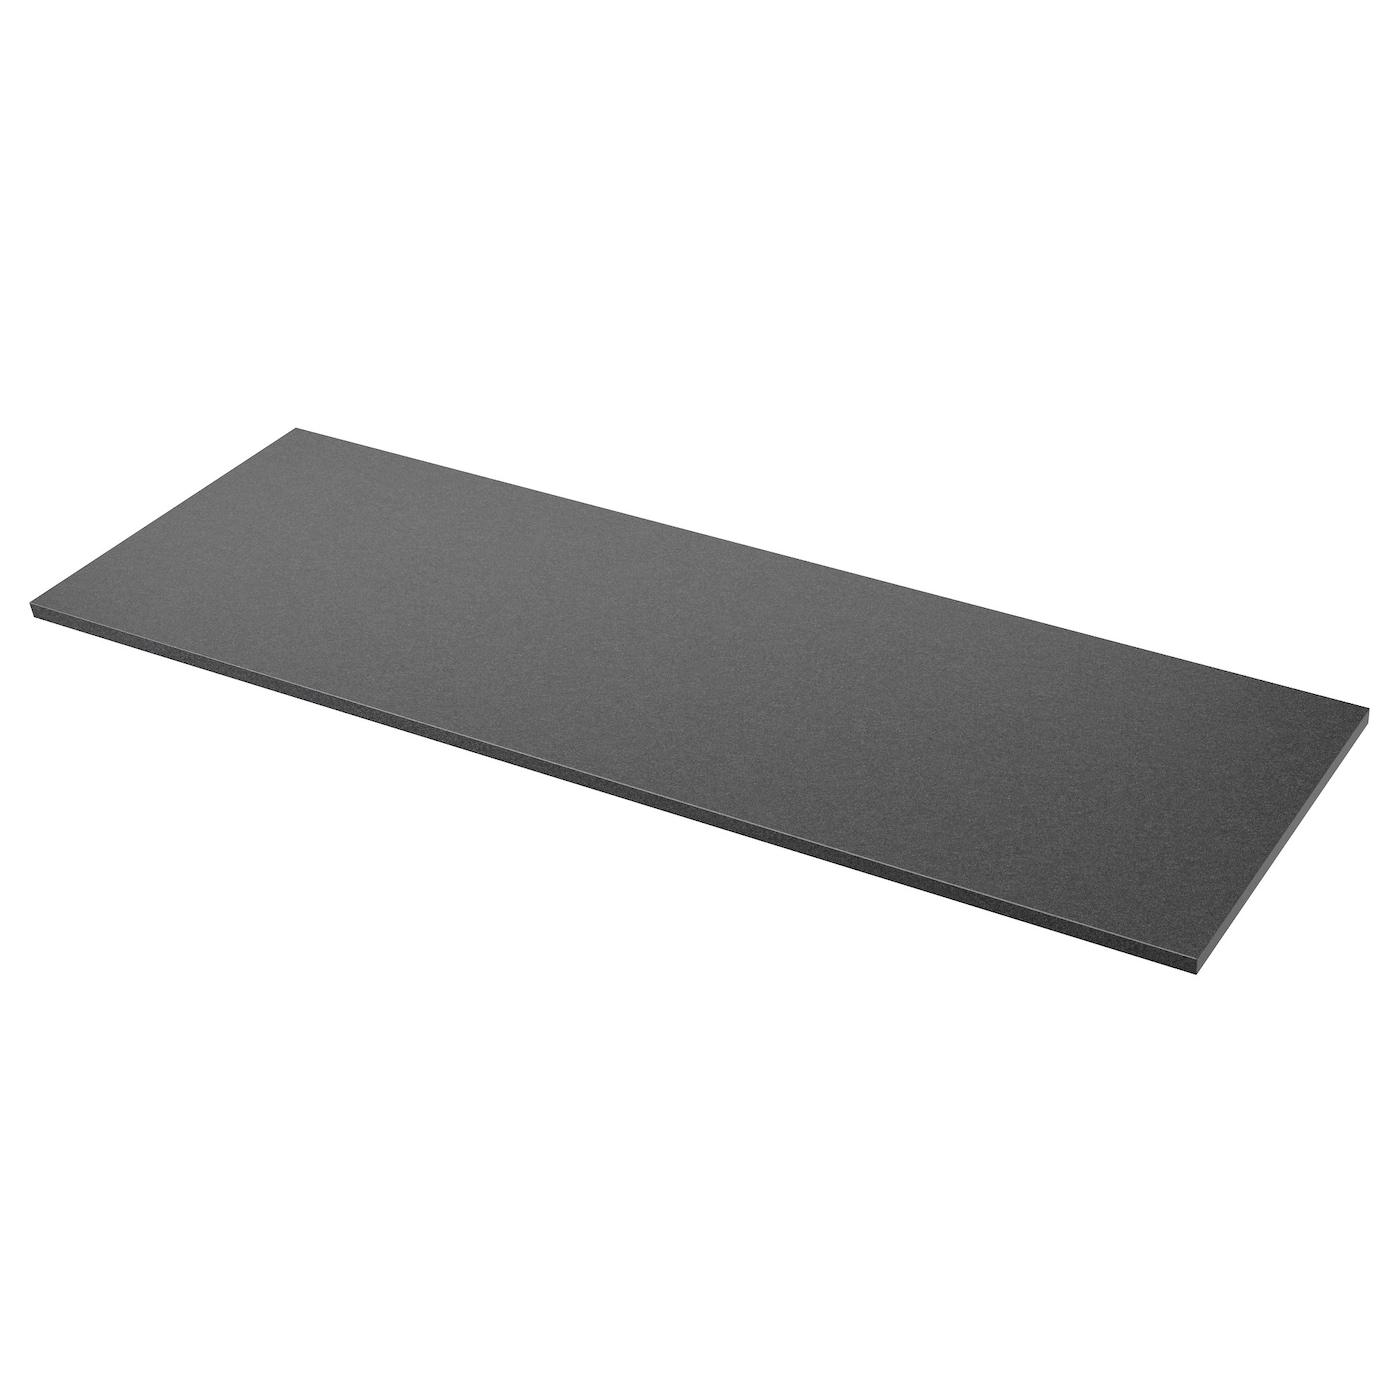 ekbacken plan de travail sur mesure noir motif pierre stratifi 10 45x2 8 cm ikea. Black Bedroom Furniture Sets. Home Design Ideas